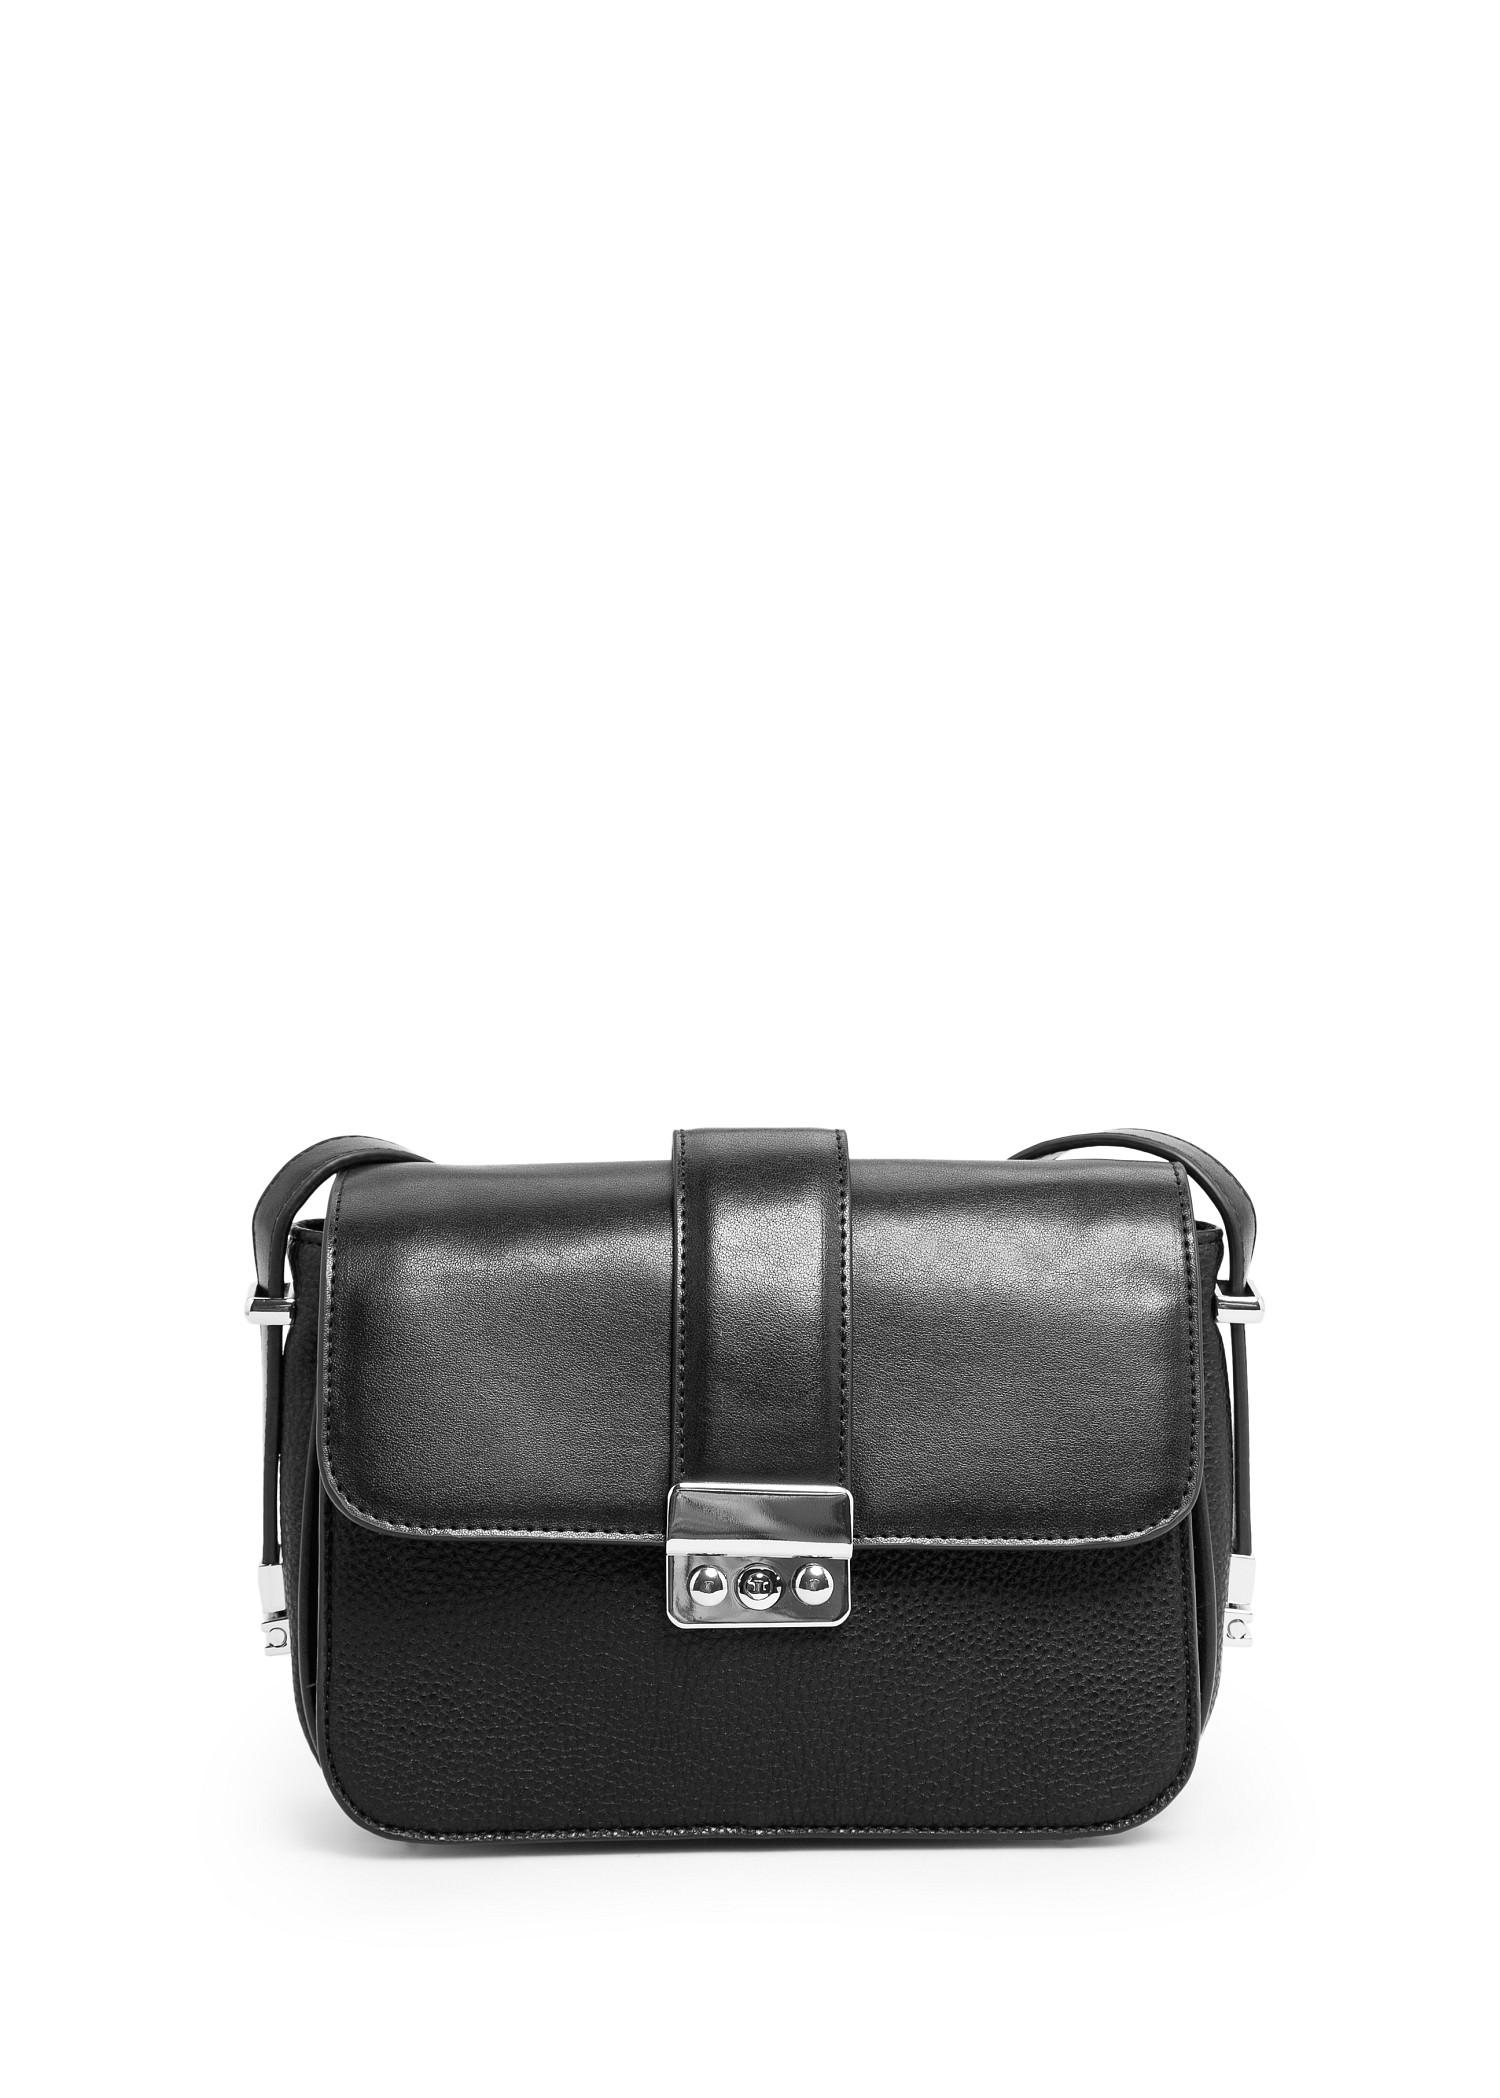 Pebbled cross body bag - Bags for Women | MANGO